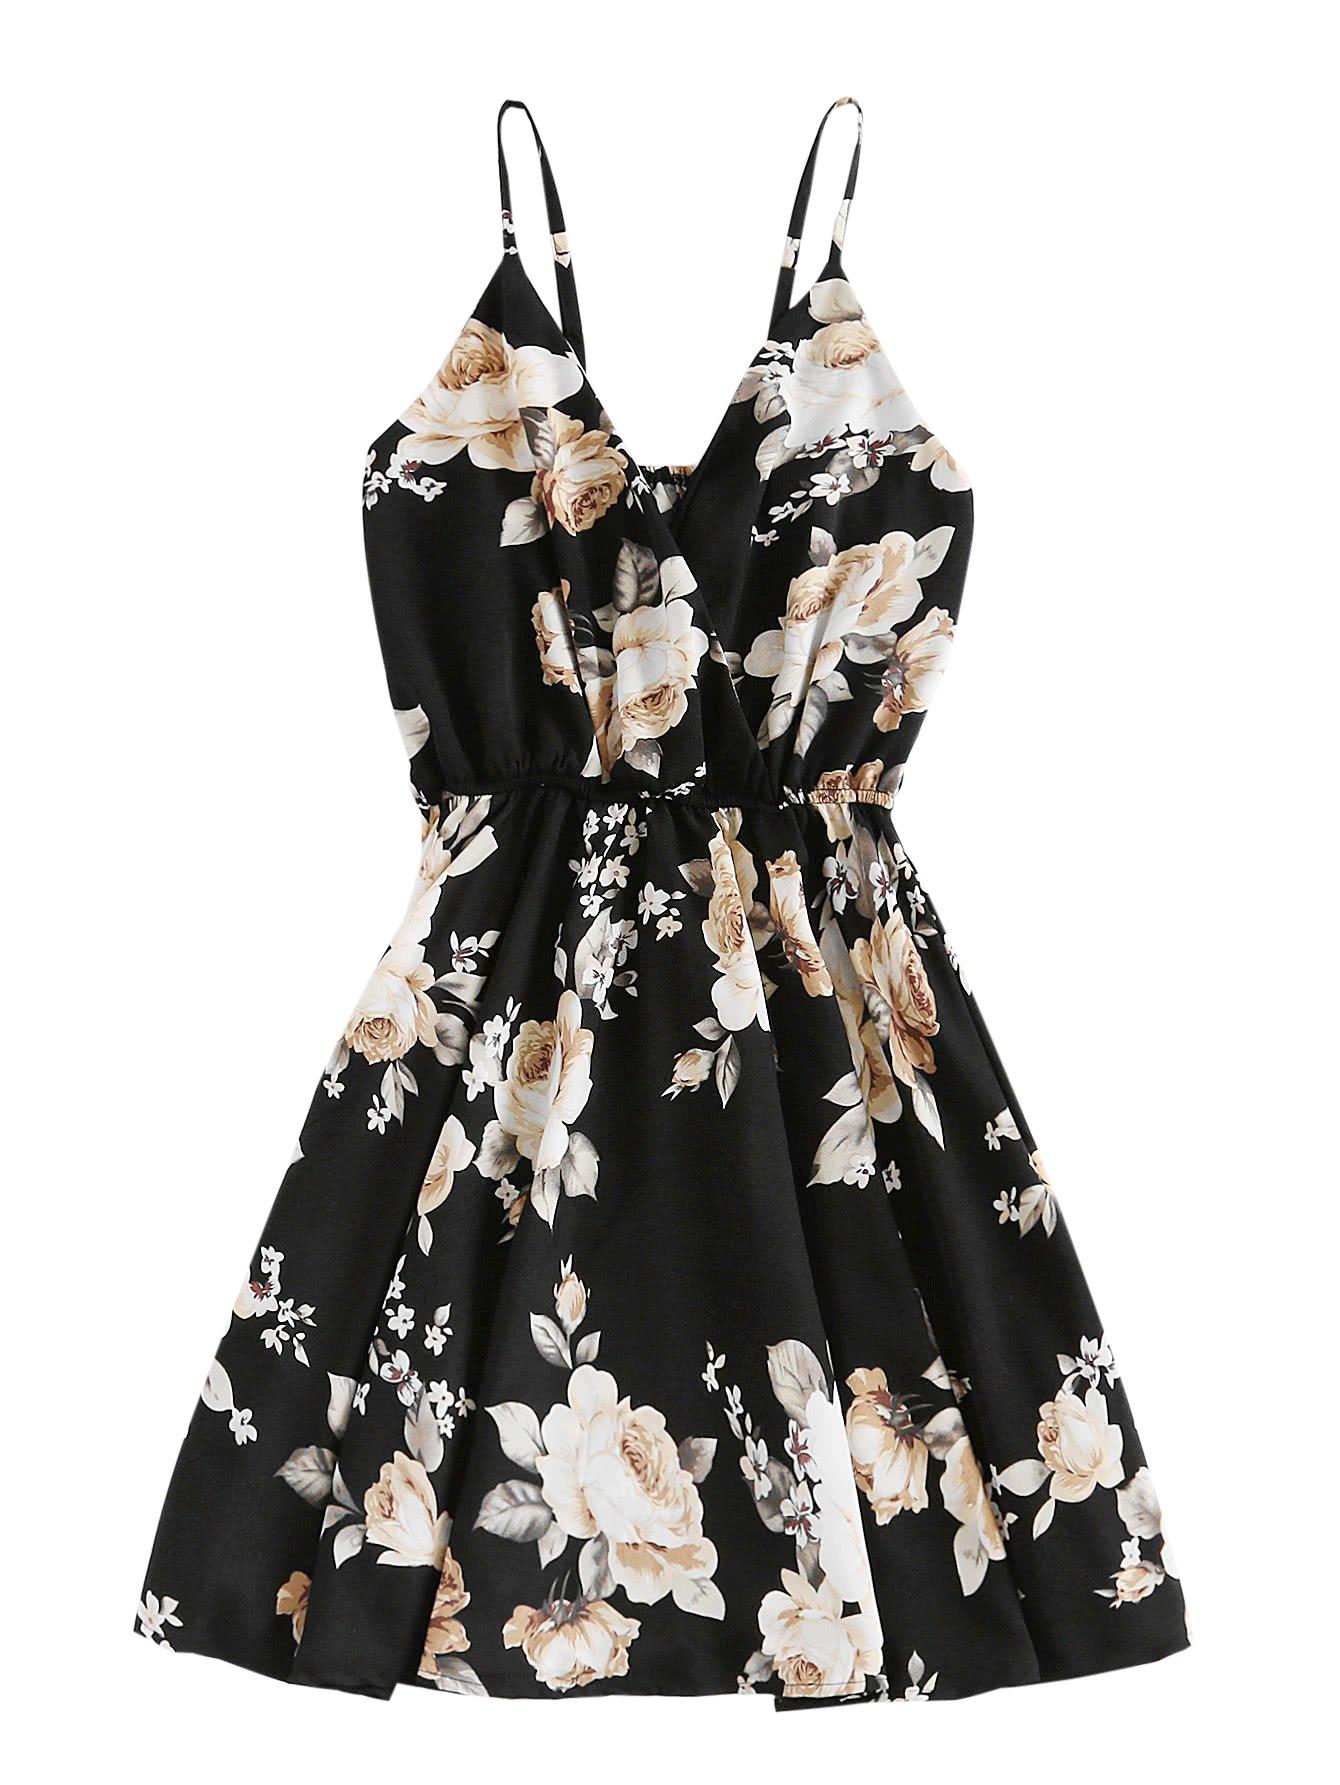 SheIn Women's Casual Boho Summer V Neck Floral Print Cami Dress Black Small